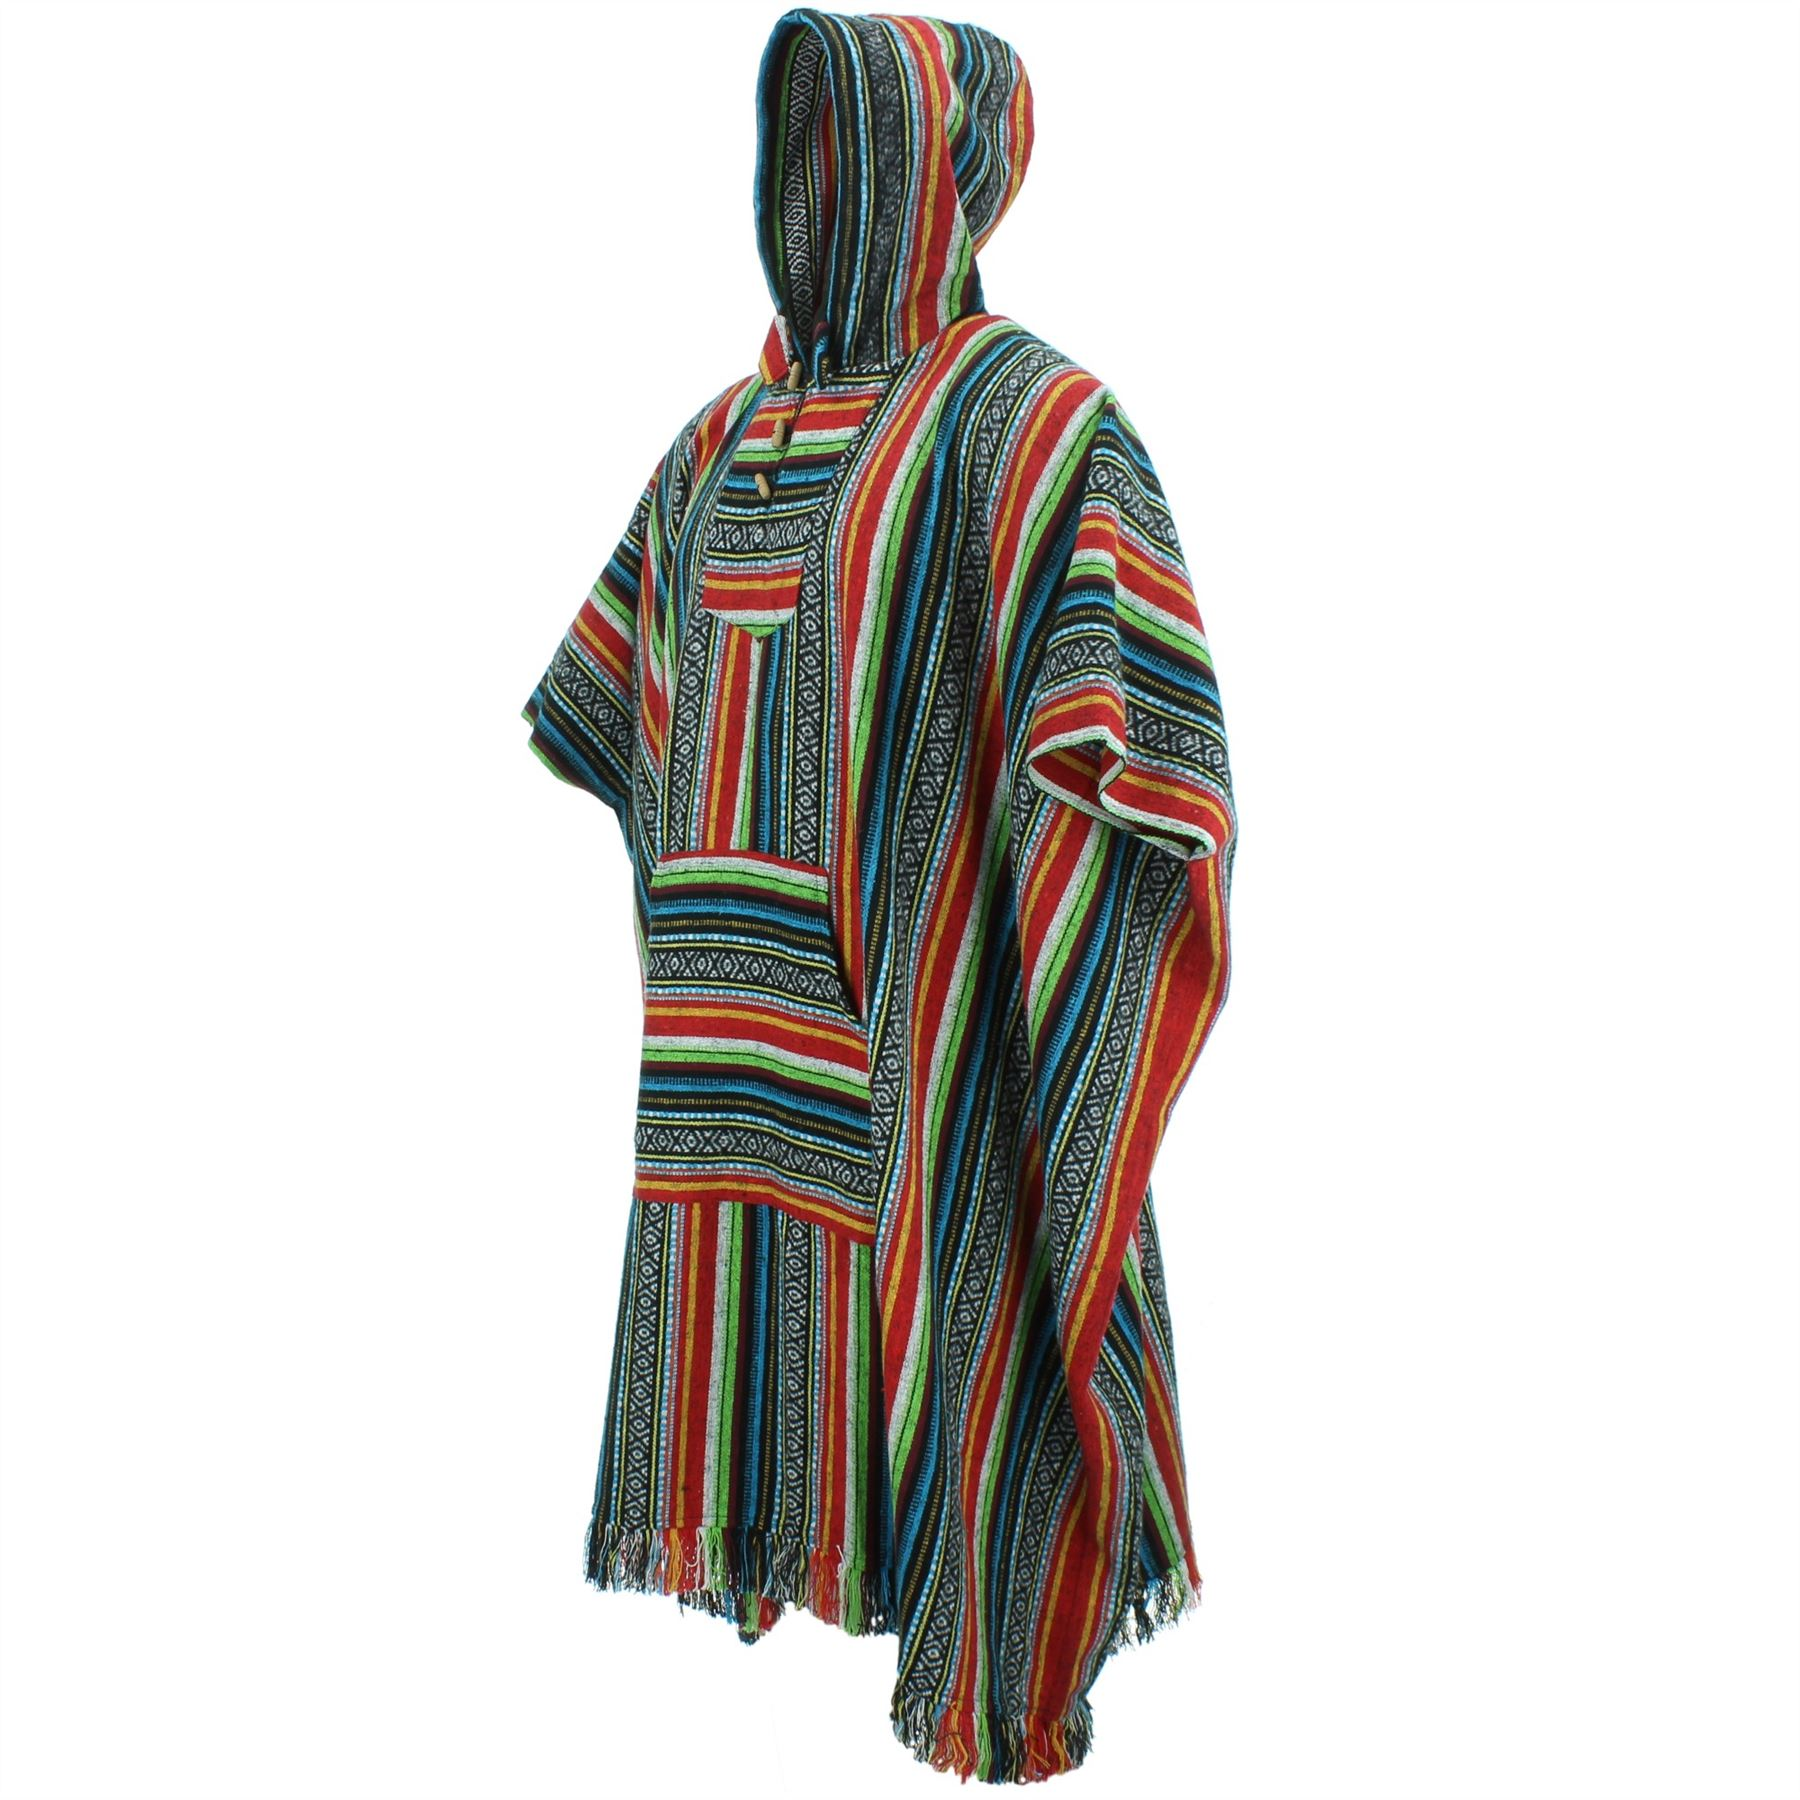 Poncho-Hooded-Cape-Cotton-Warm-Festival-Long-Woven-Rainbow-Men-Women thumbnail 8